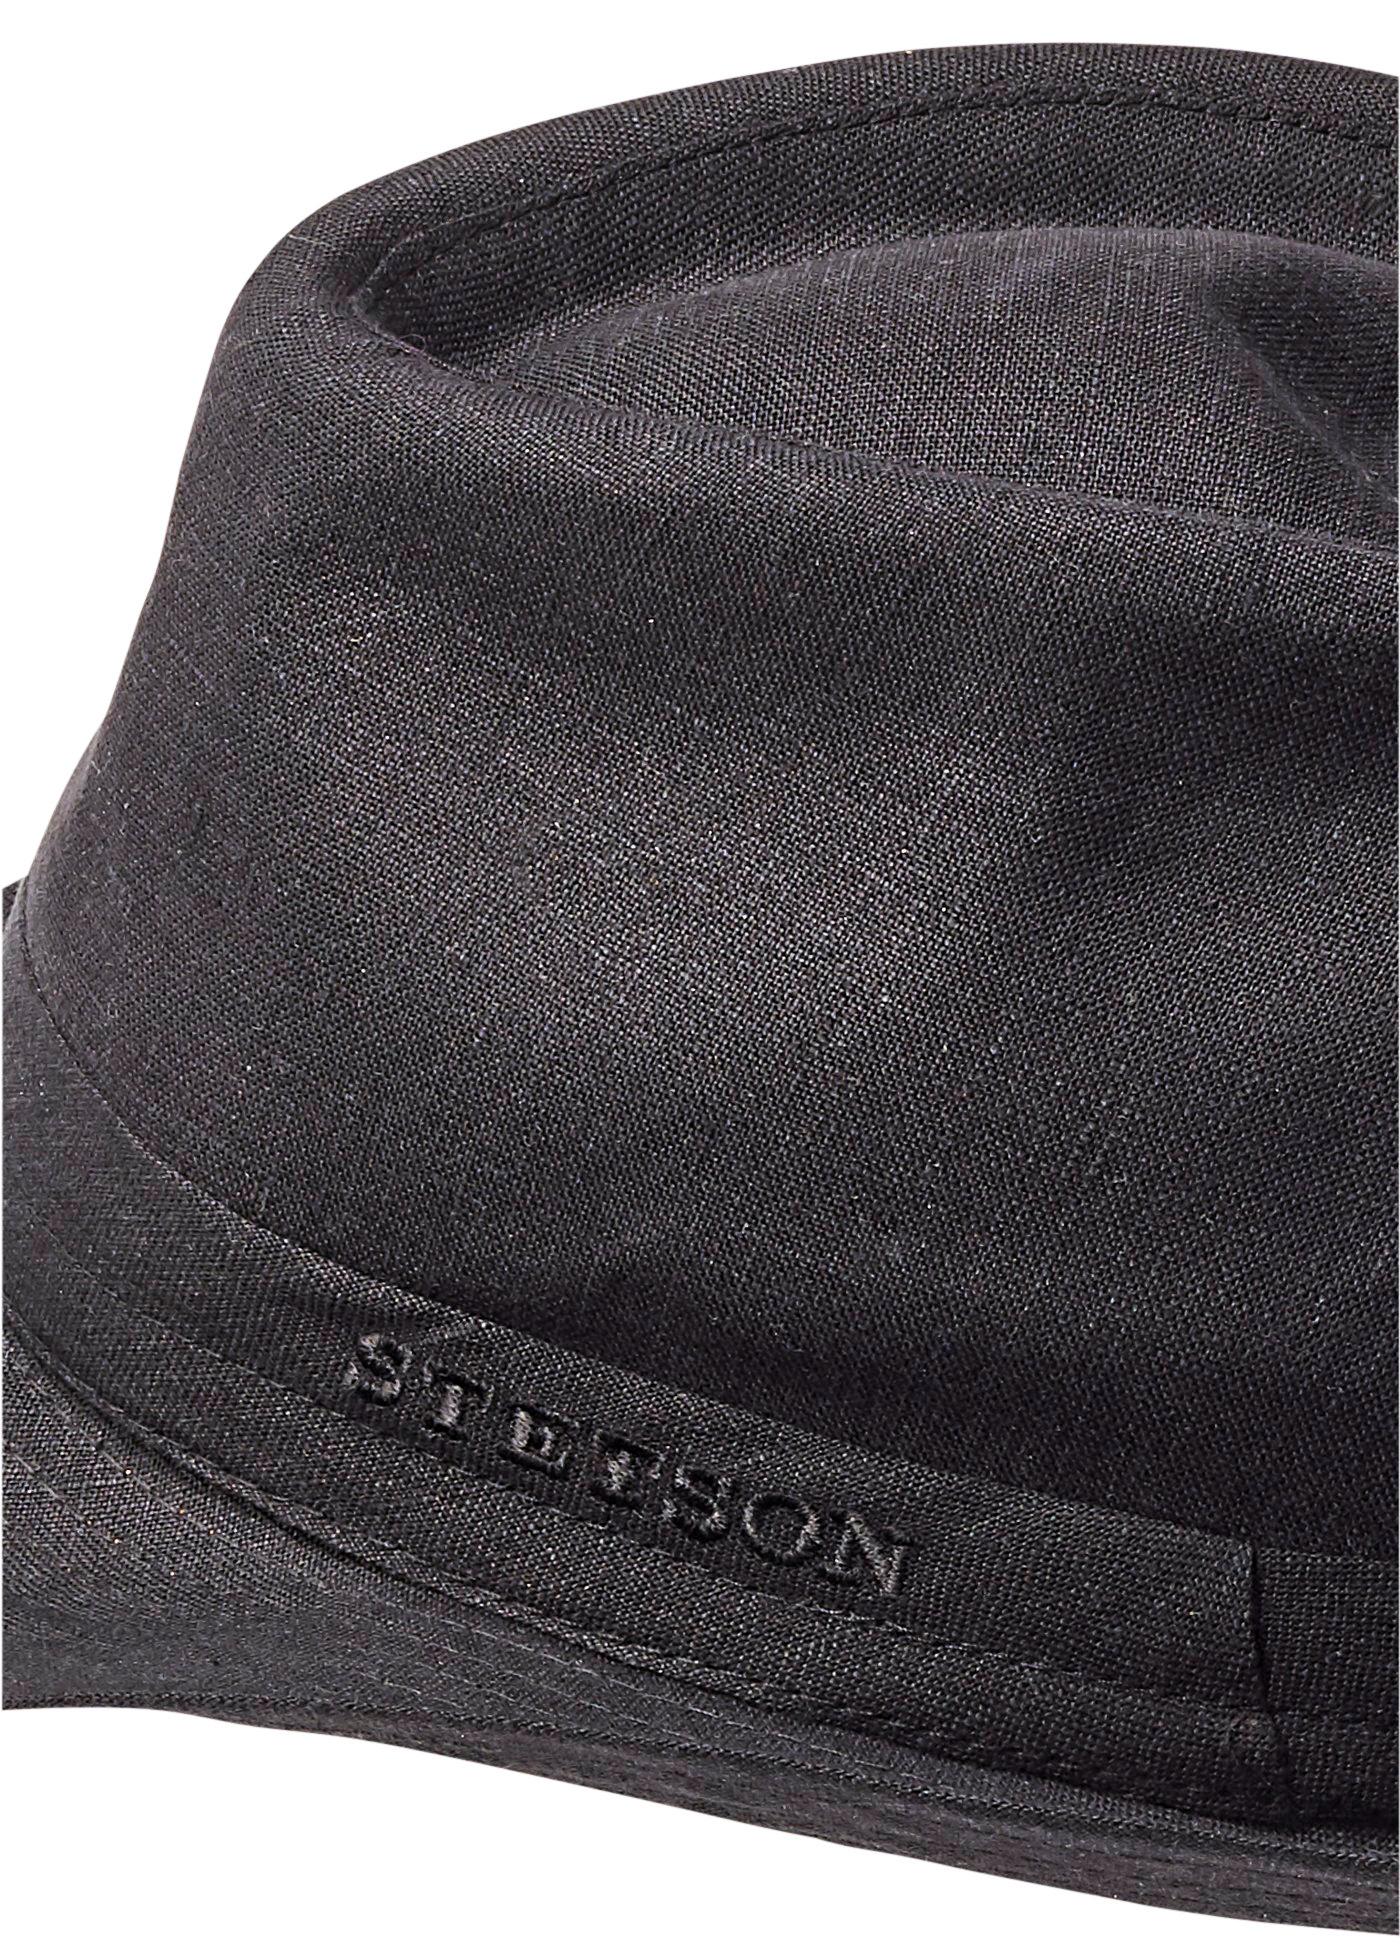 Trilby Linen image number 1